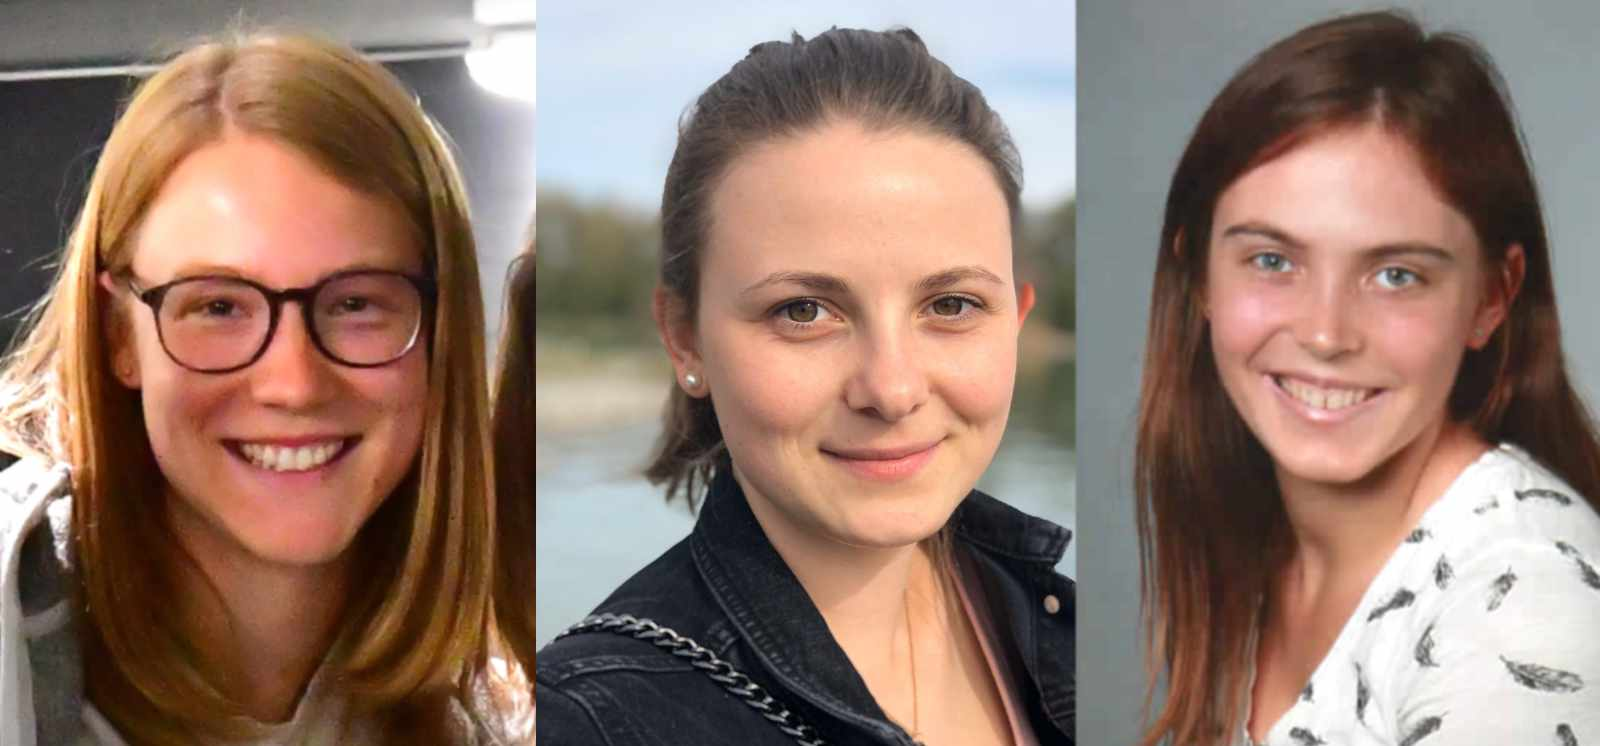 Unsere ISP-Studentinnen Fabienne Dinner, Jenny Neizert und Julia Joos